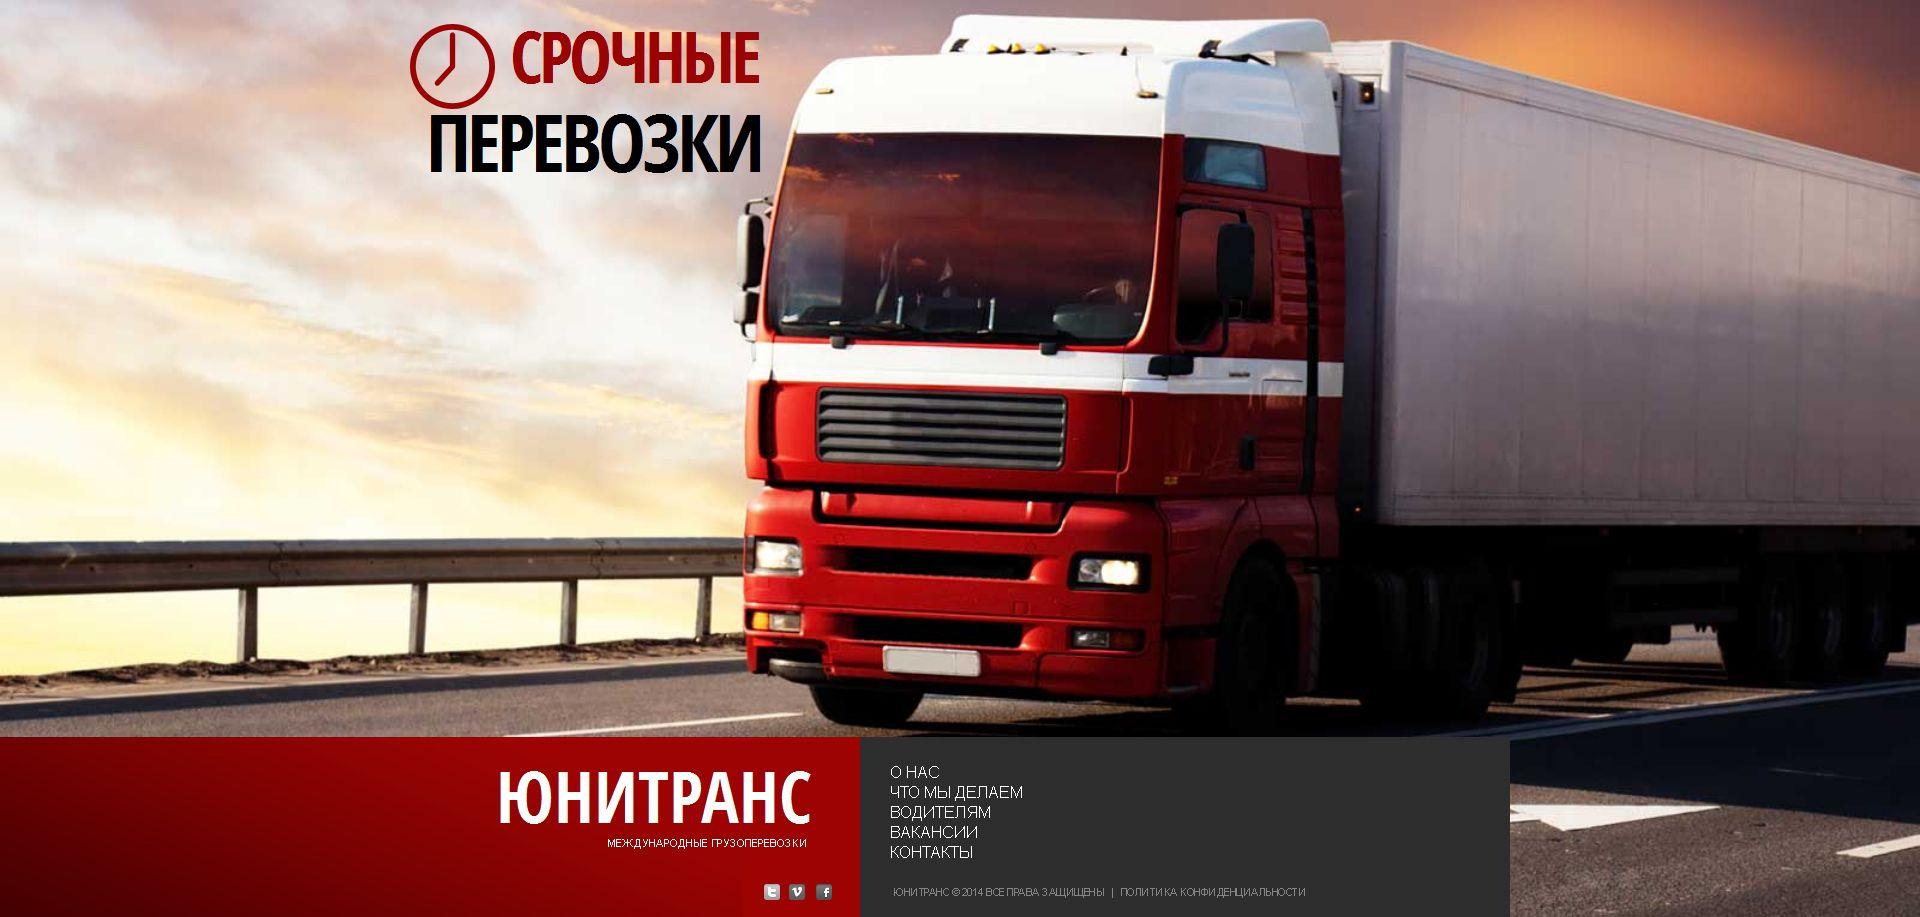 Premium Moto CMS HTML Template RU over Vrachtvervoer №50582